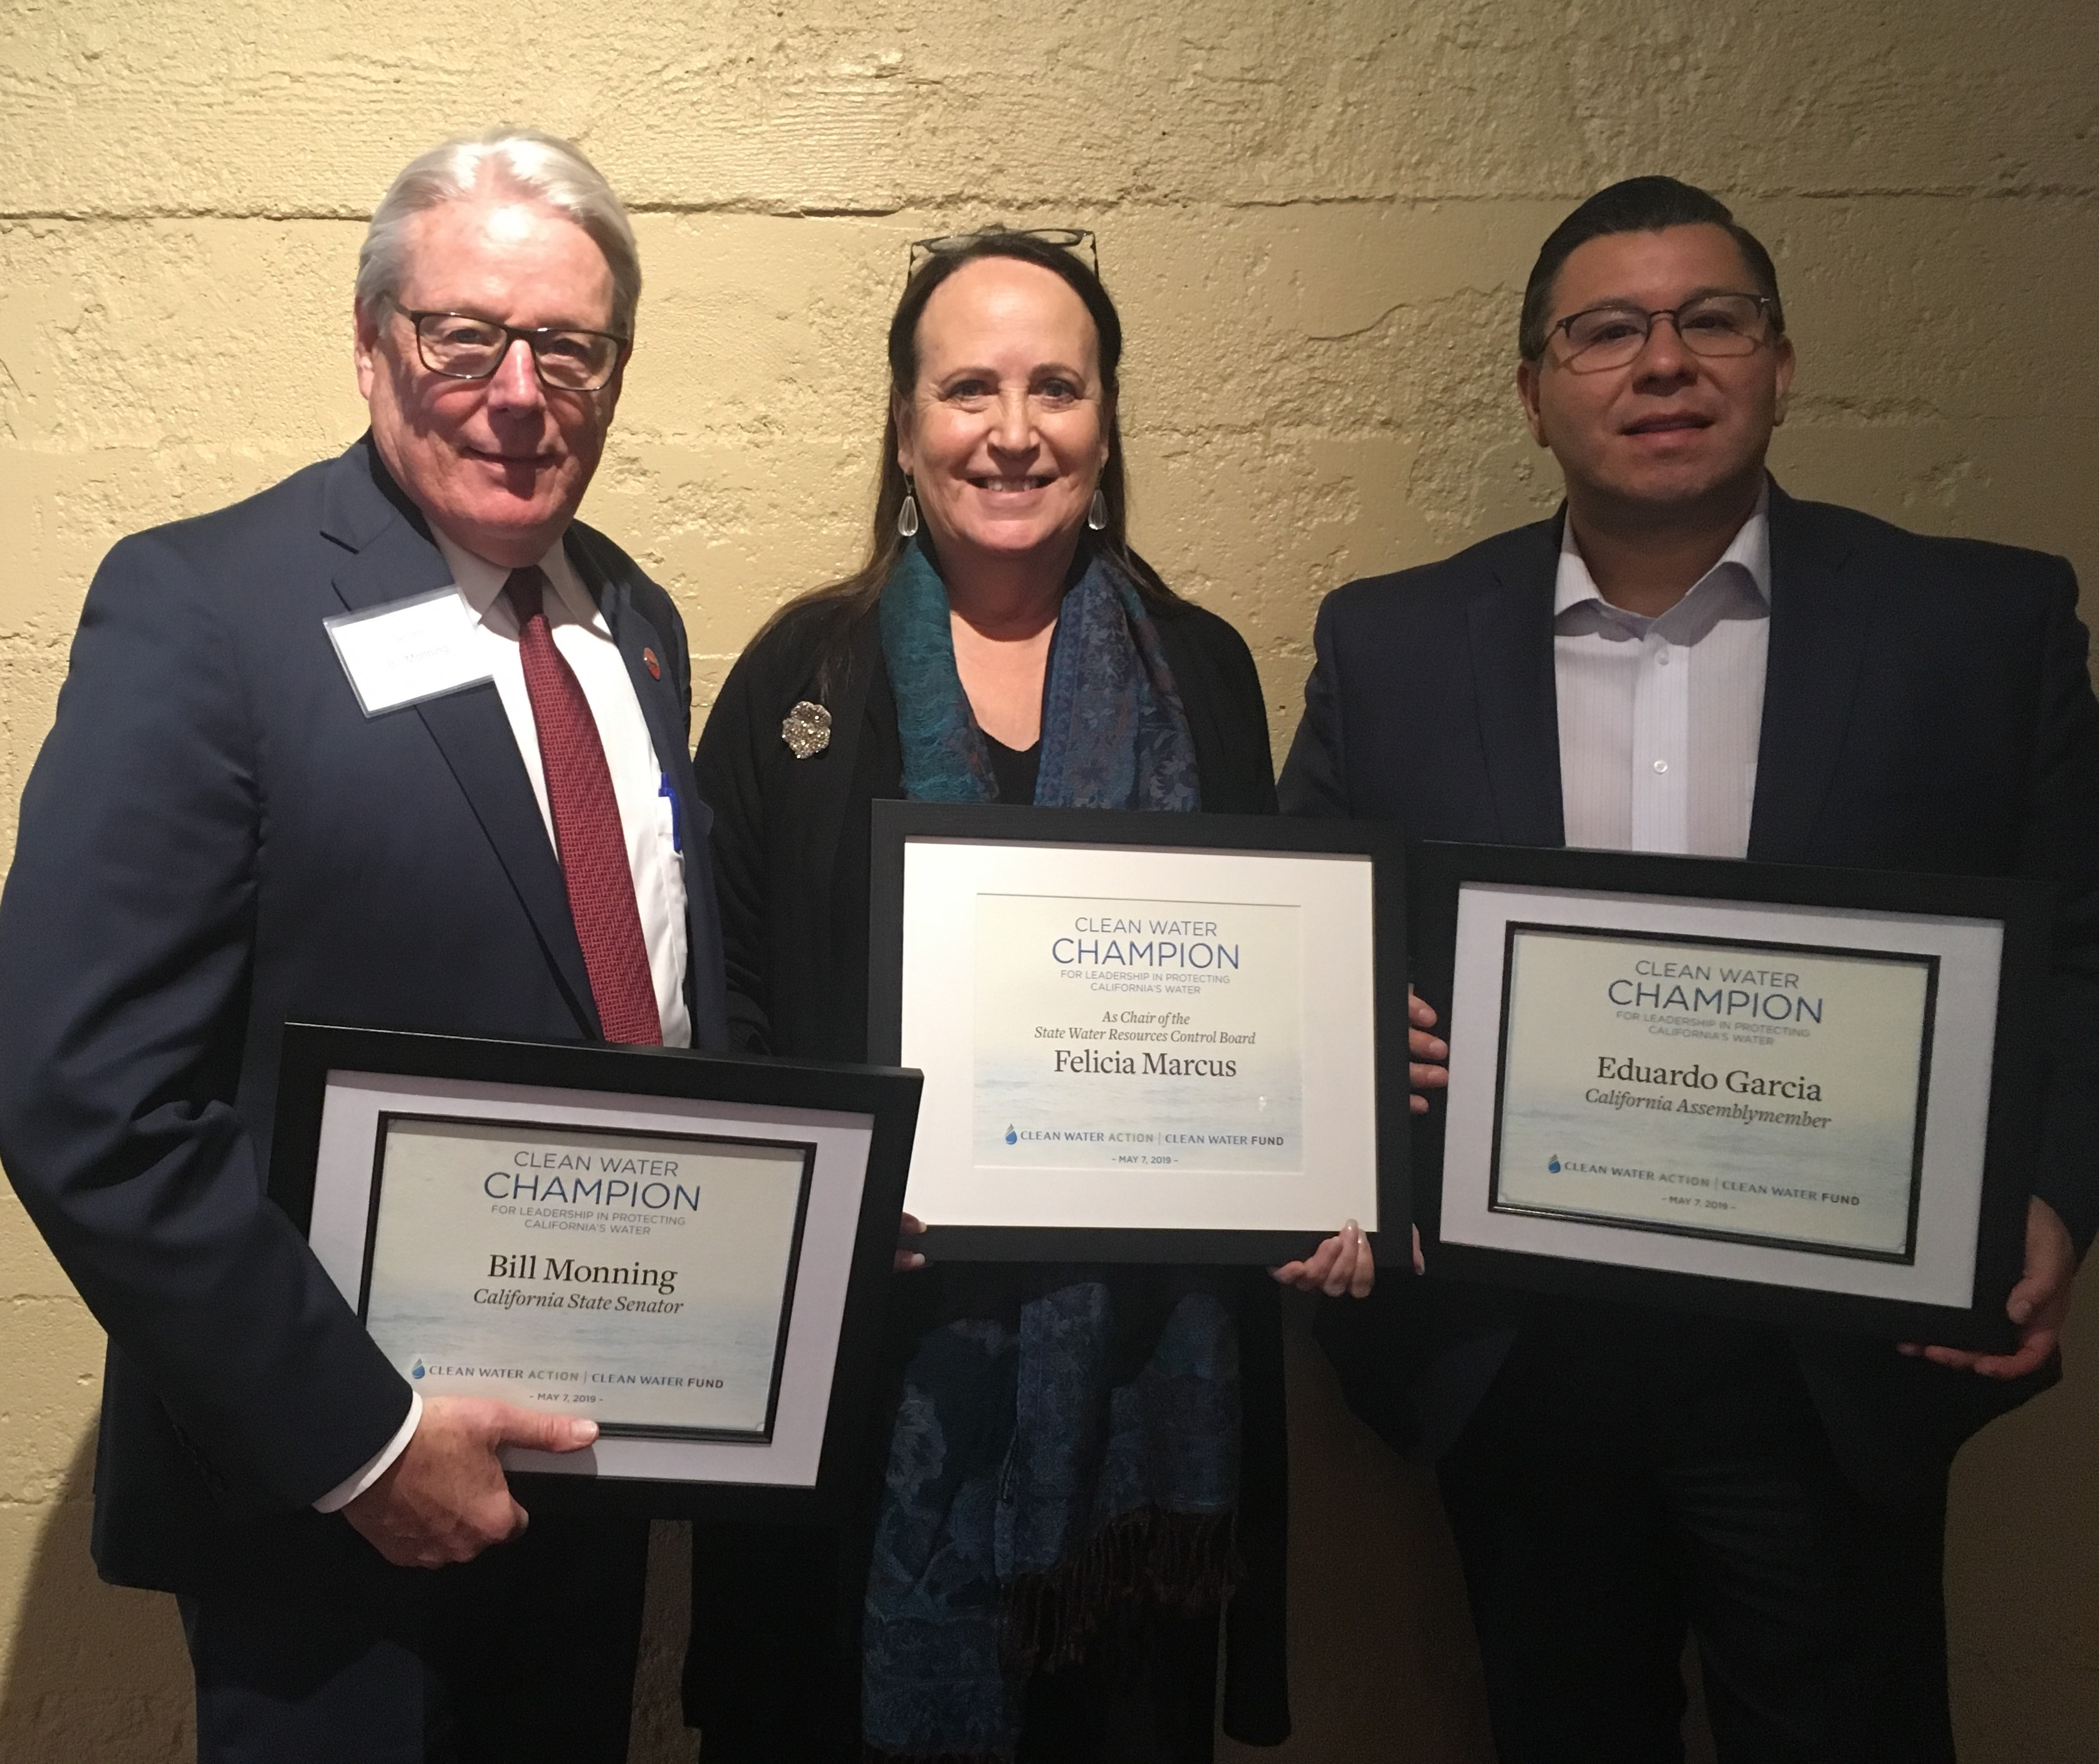 Environmental Champion Reception Honorees